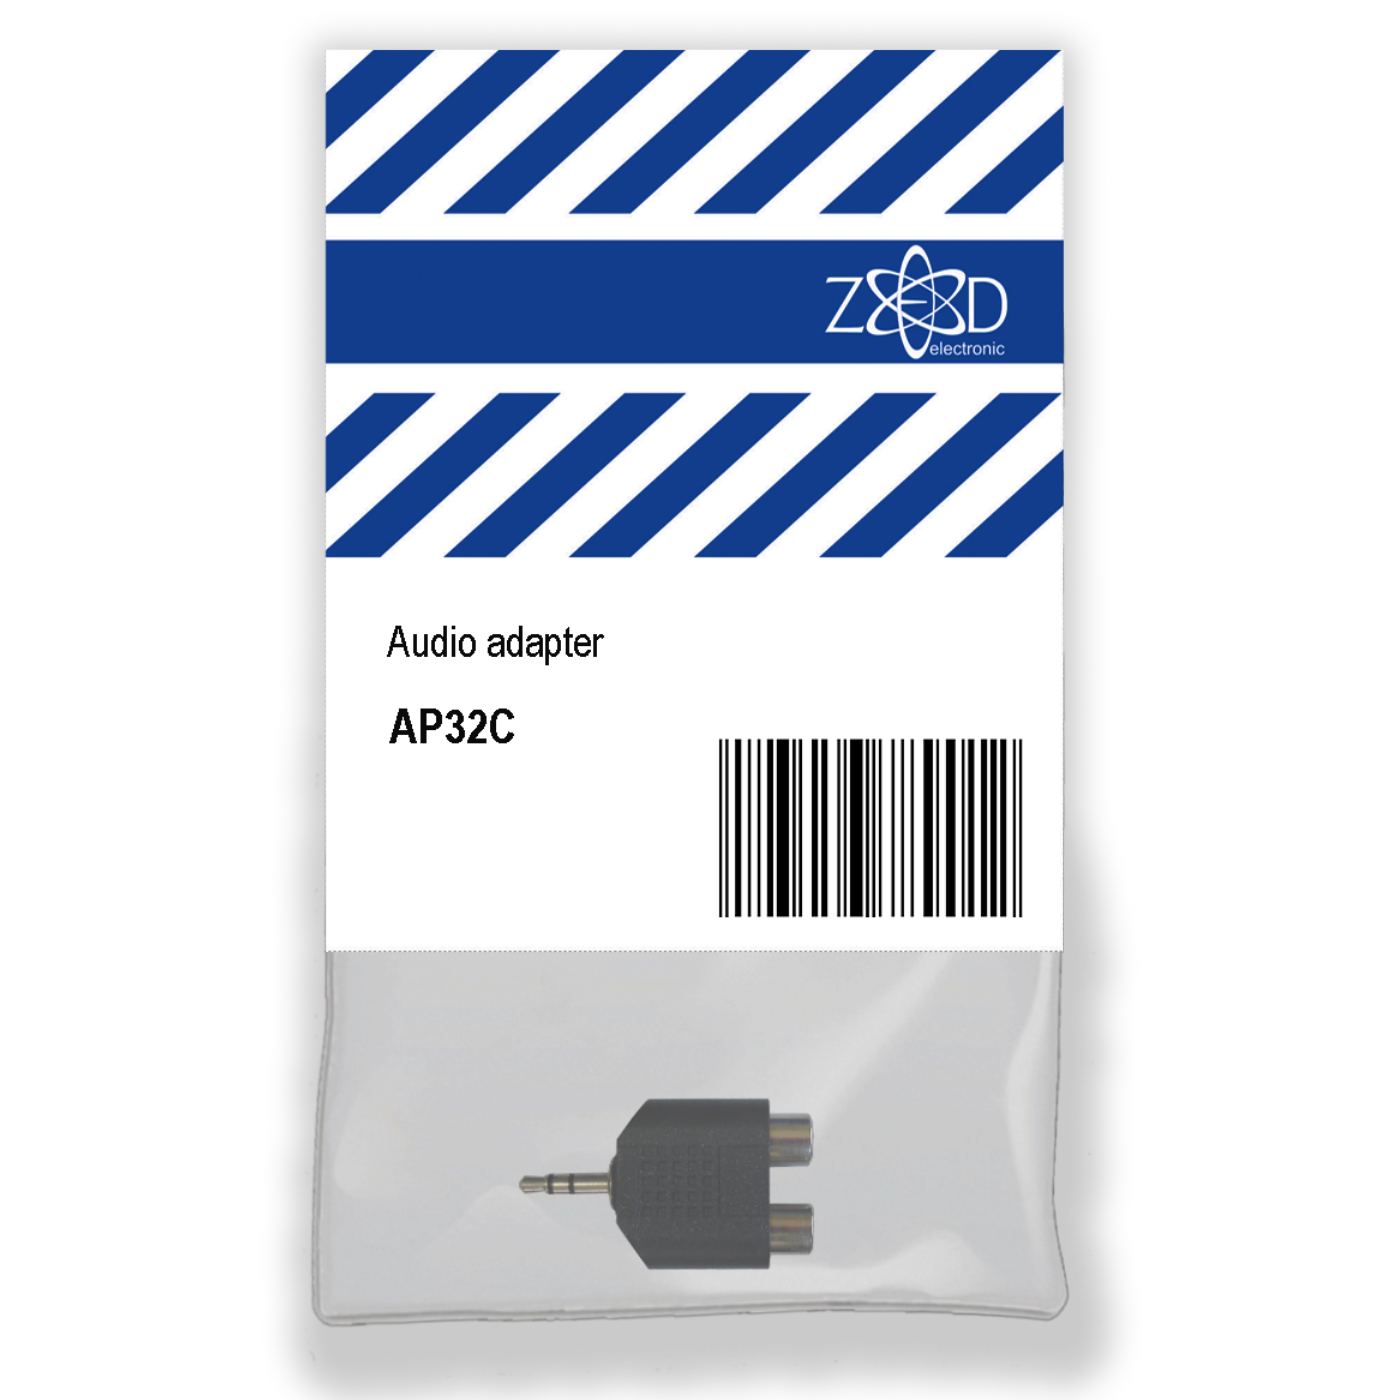 ZED electronic - AP32C